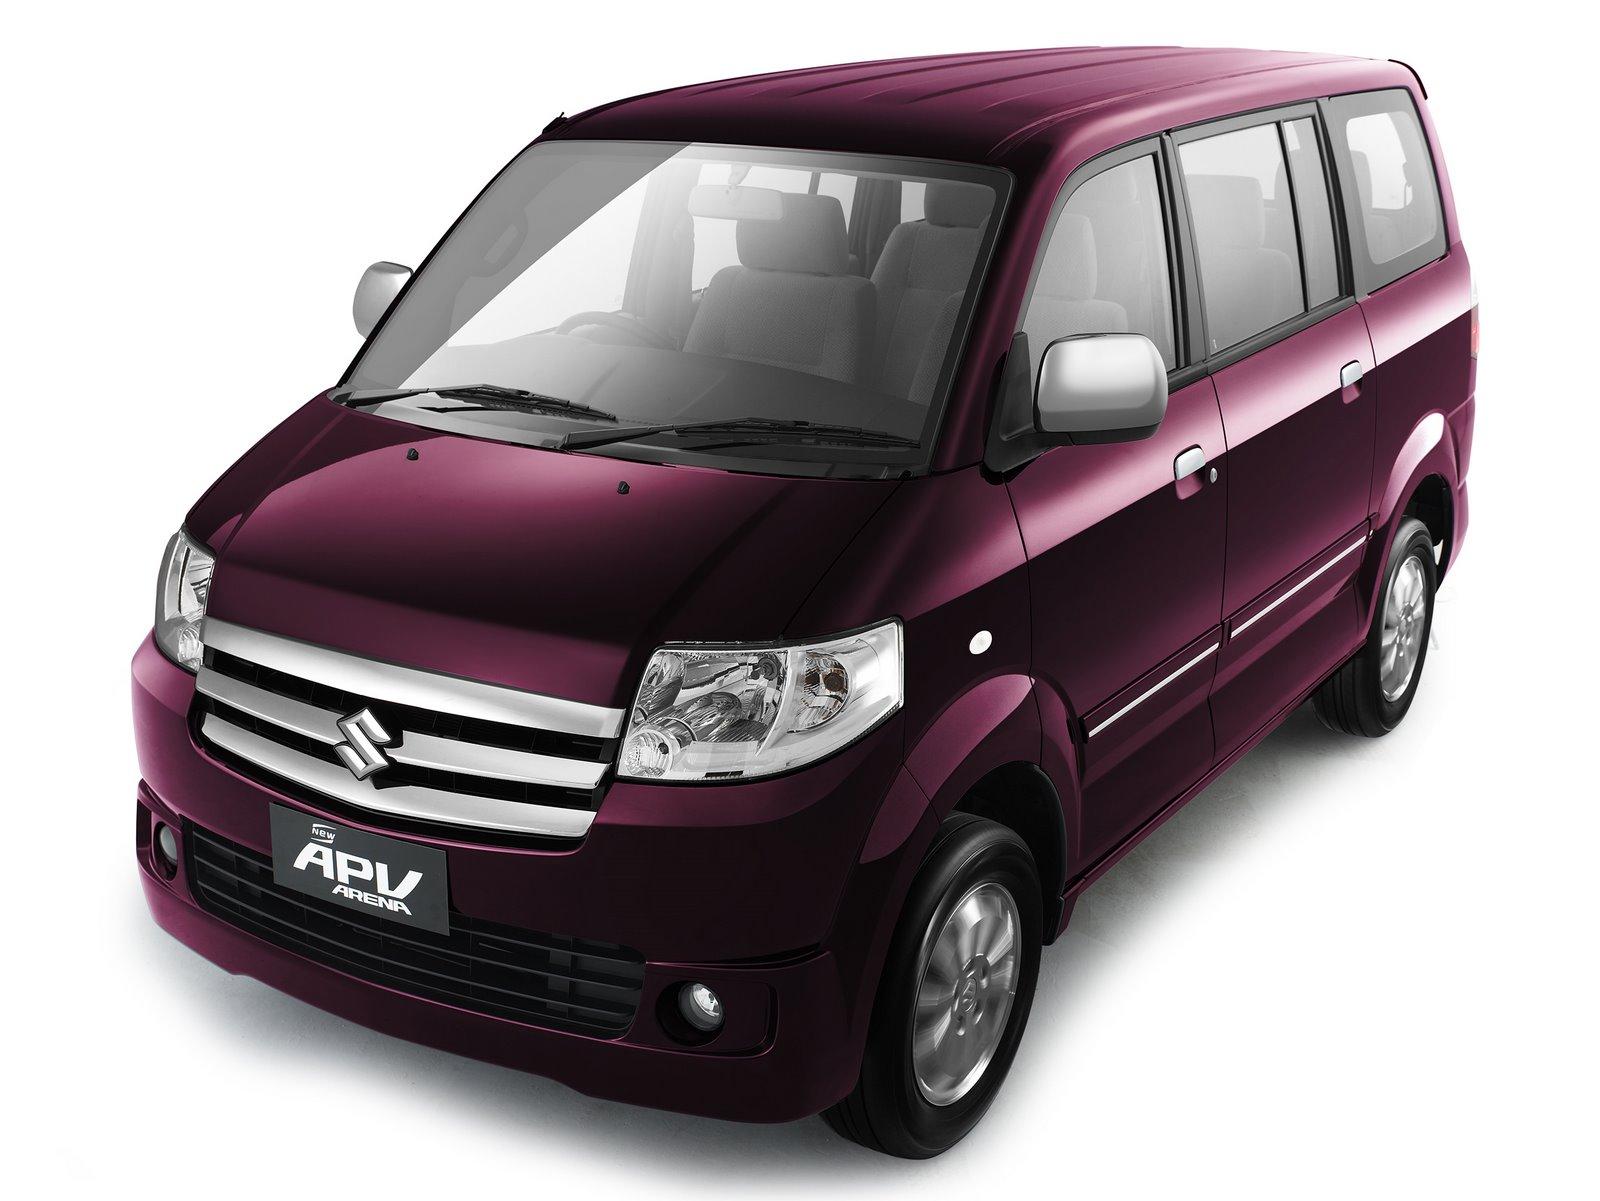 Suzuki Apv Price In Pakistan